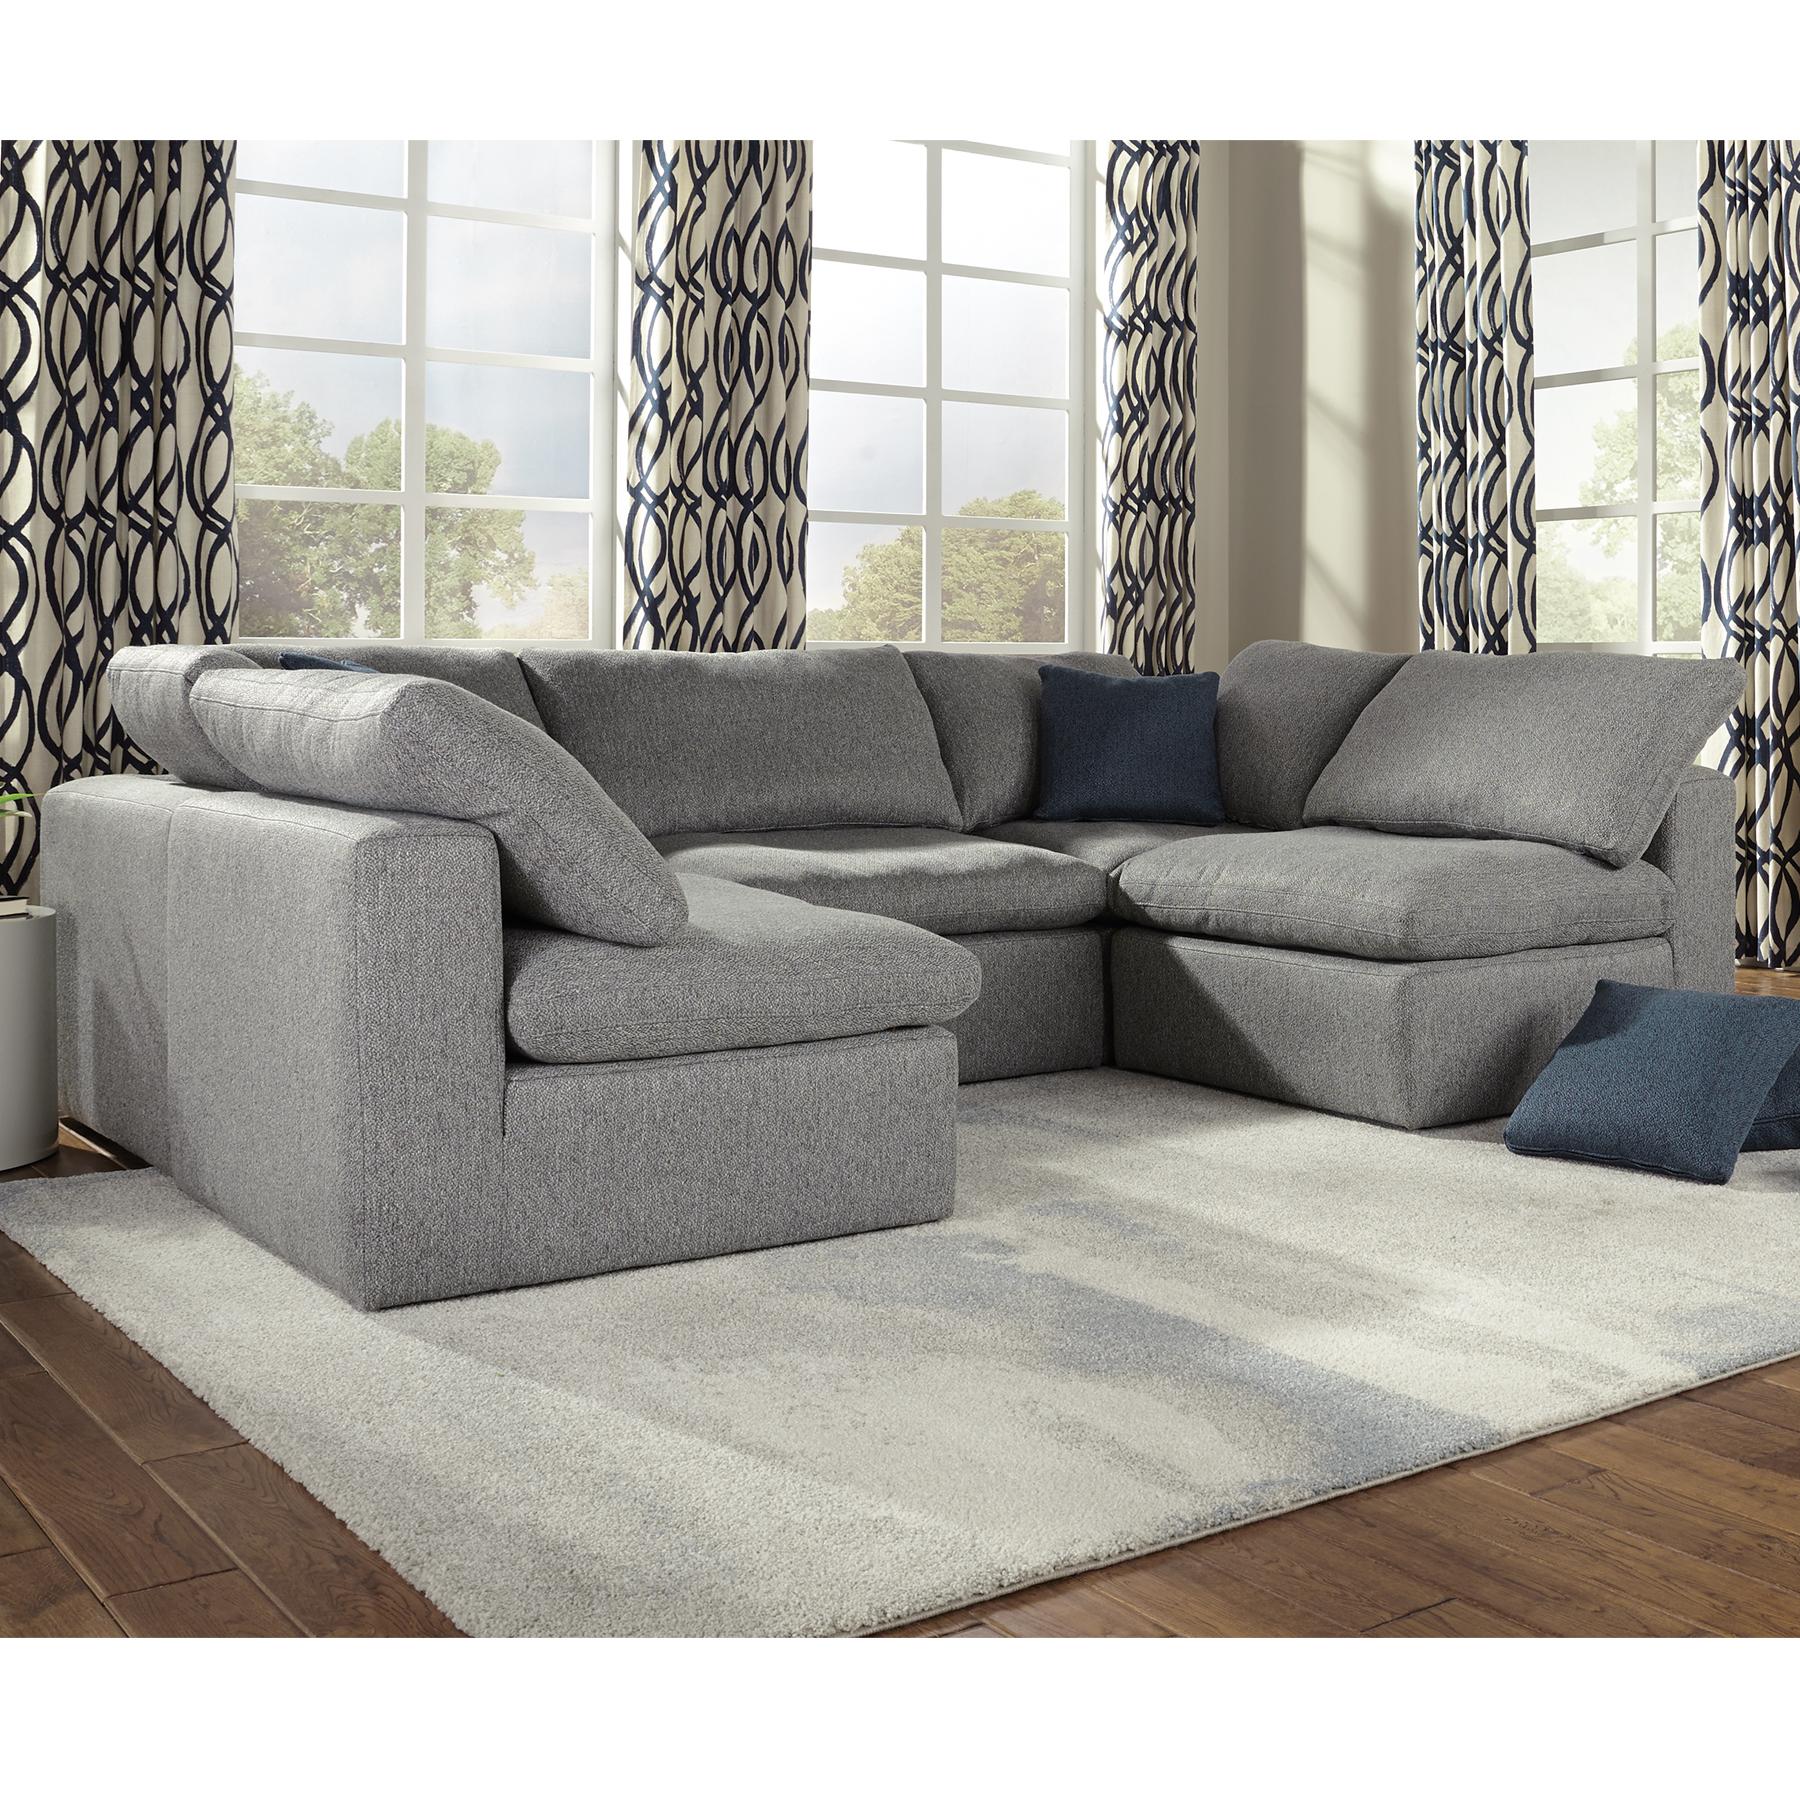 Pleasing Bloom Modular Sectional 150 Fabrics Create Sofas And Beatyapartments Chair Design Images Beatyapartmentscom